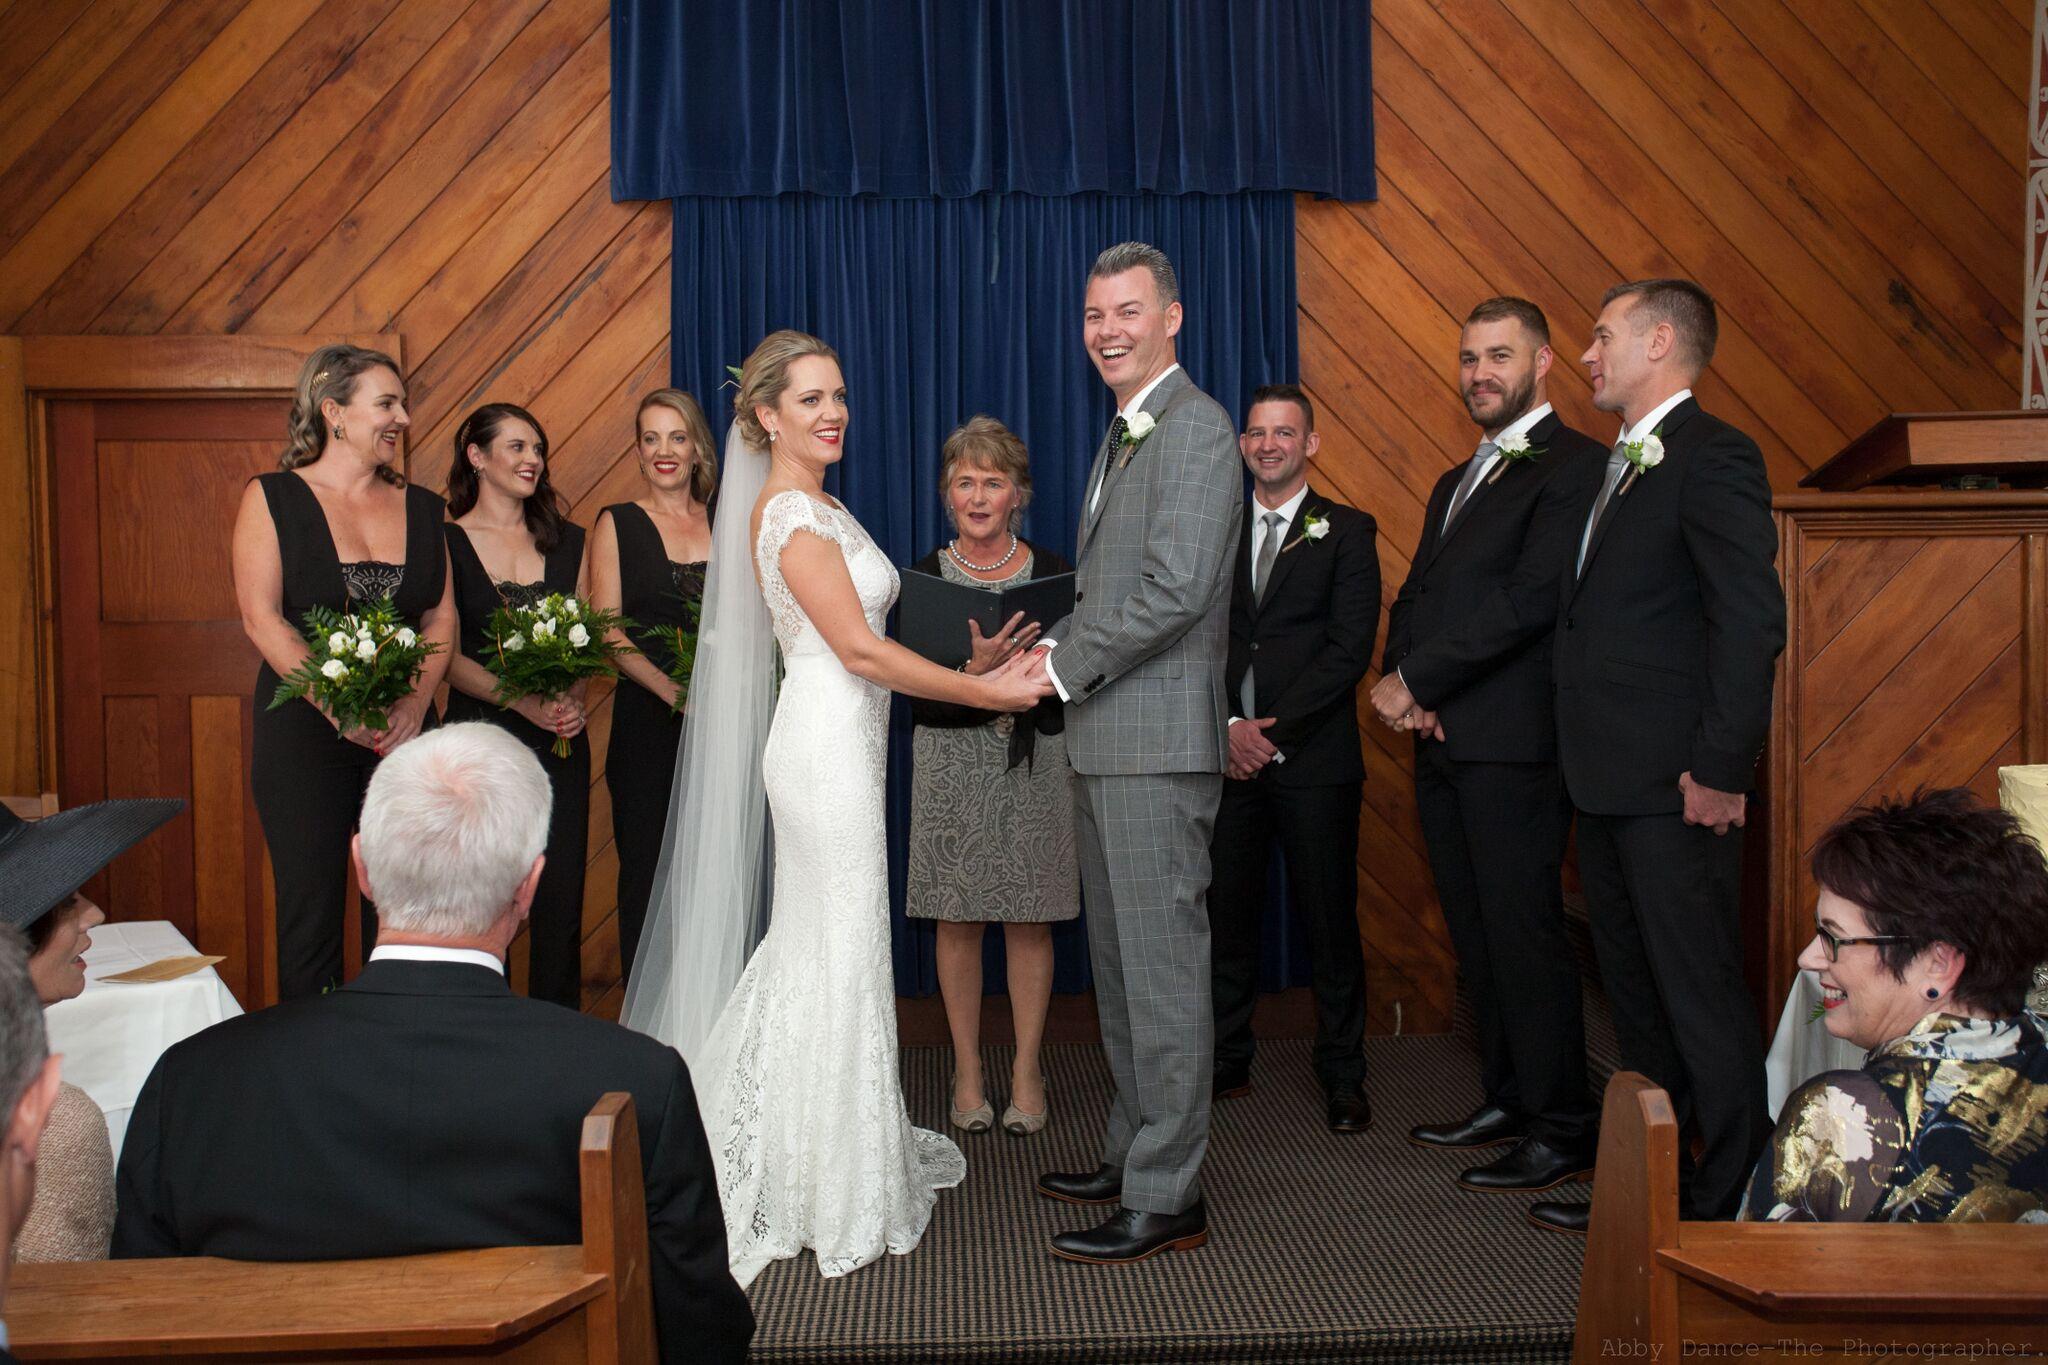 Cleo & David<br>Married at Huka Falls Resort, April 2017